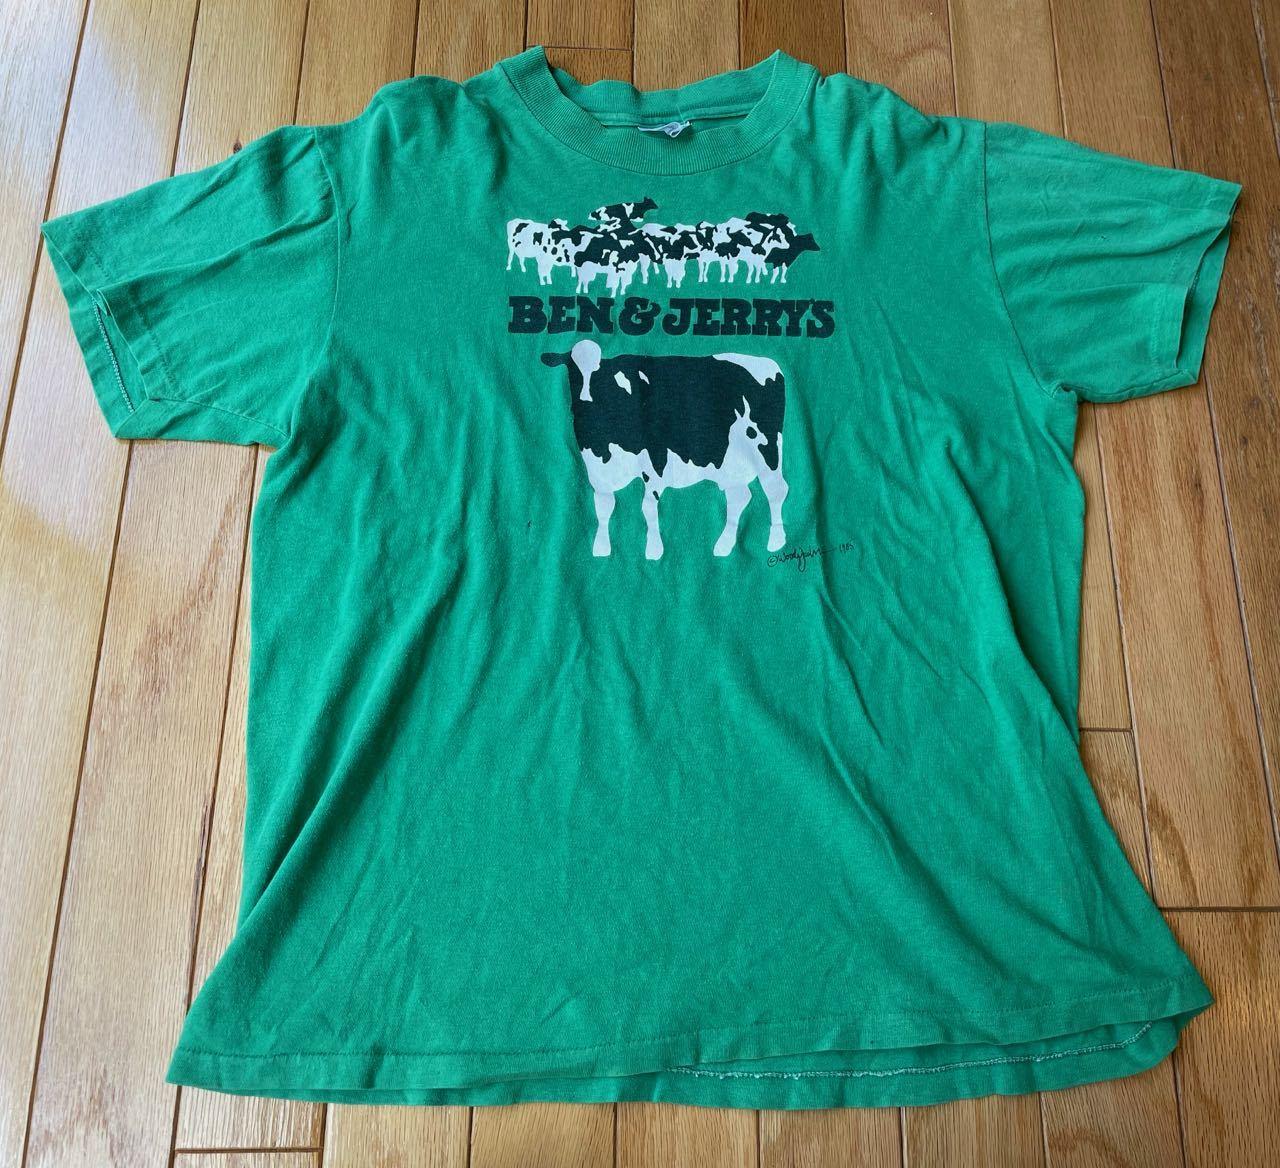 7月22日(木)入荷! 80s  BEN&JERRY\'S ICE CREAM Tシャツ!_c0144020_20334056.jpg